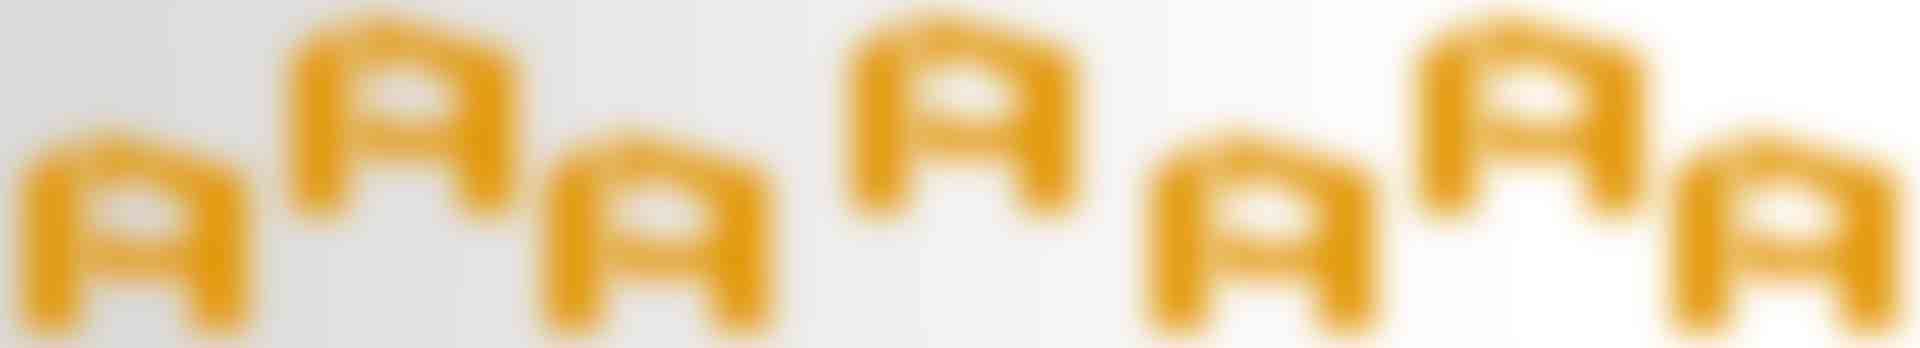 Breadcrumb image